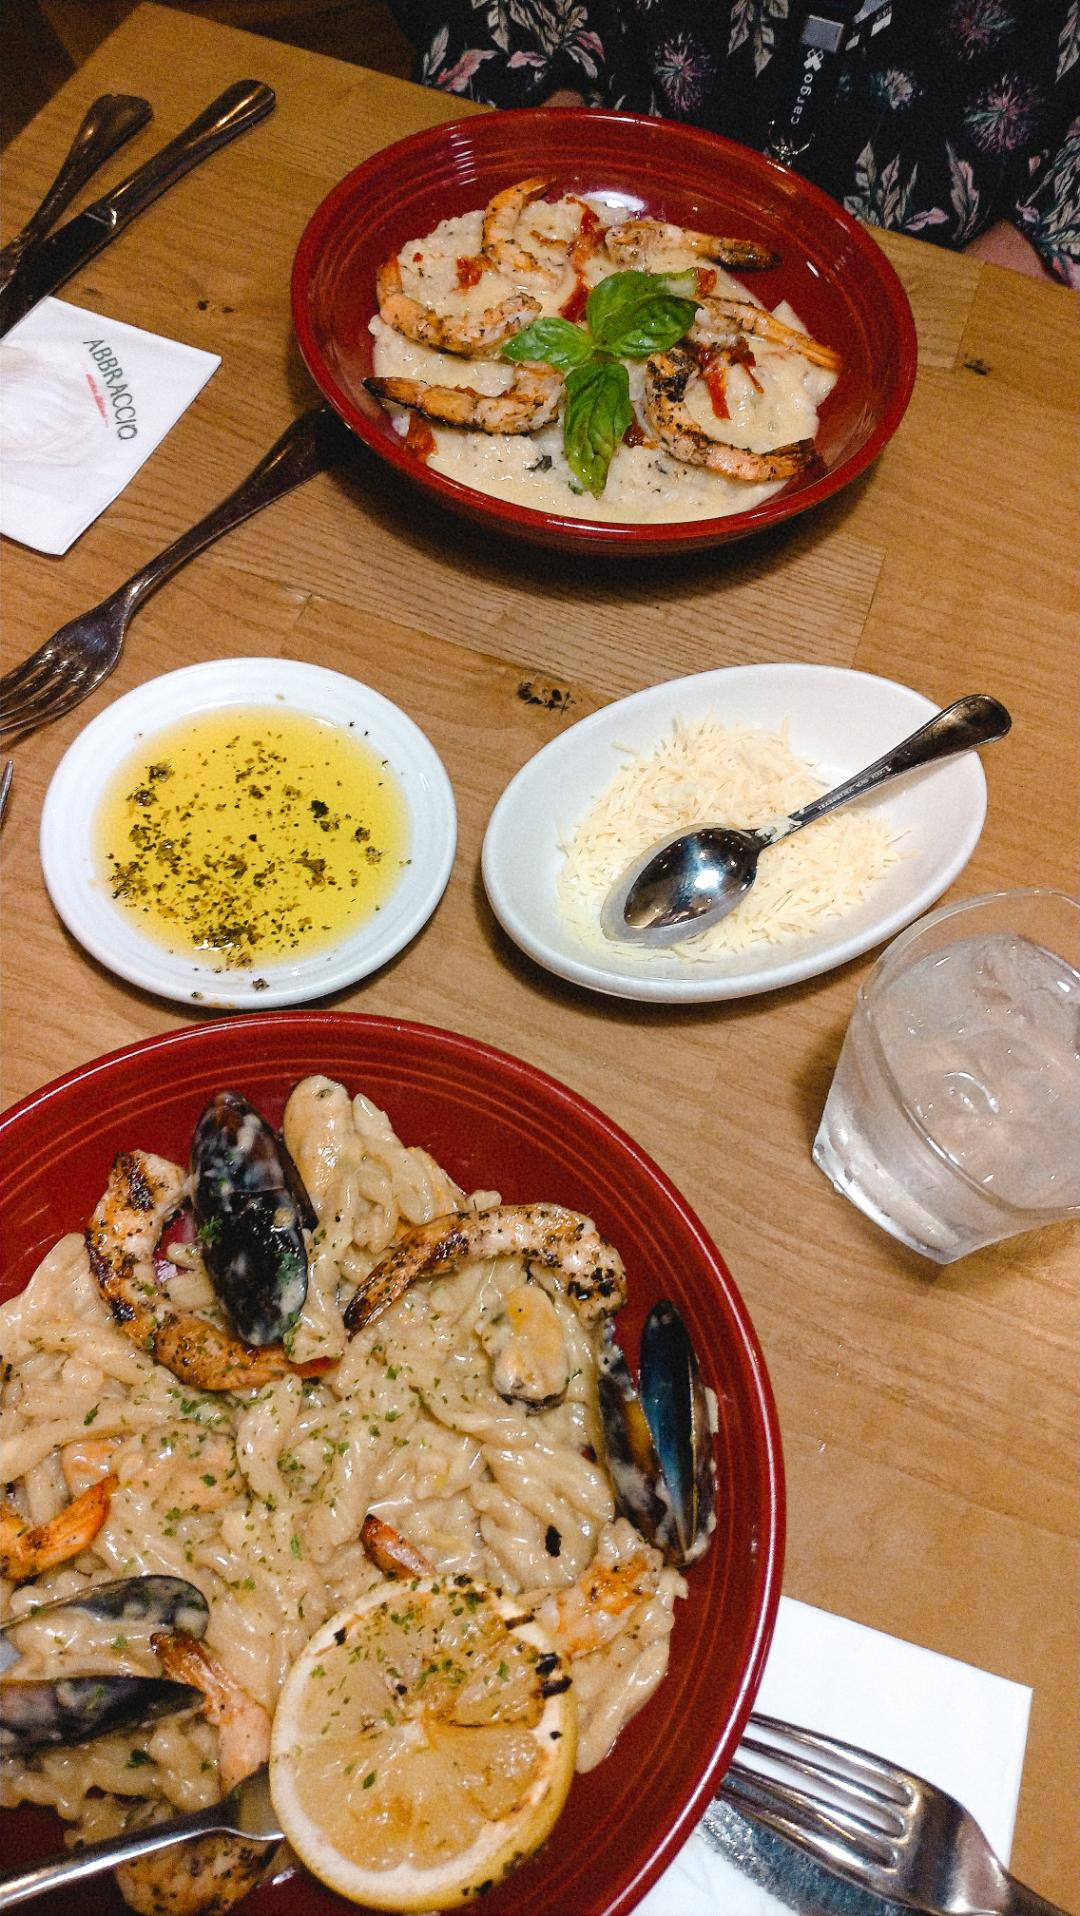 Abbraccio Cucina Italiana